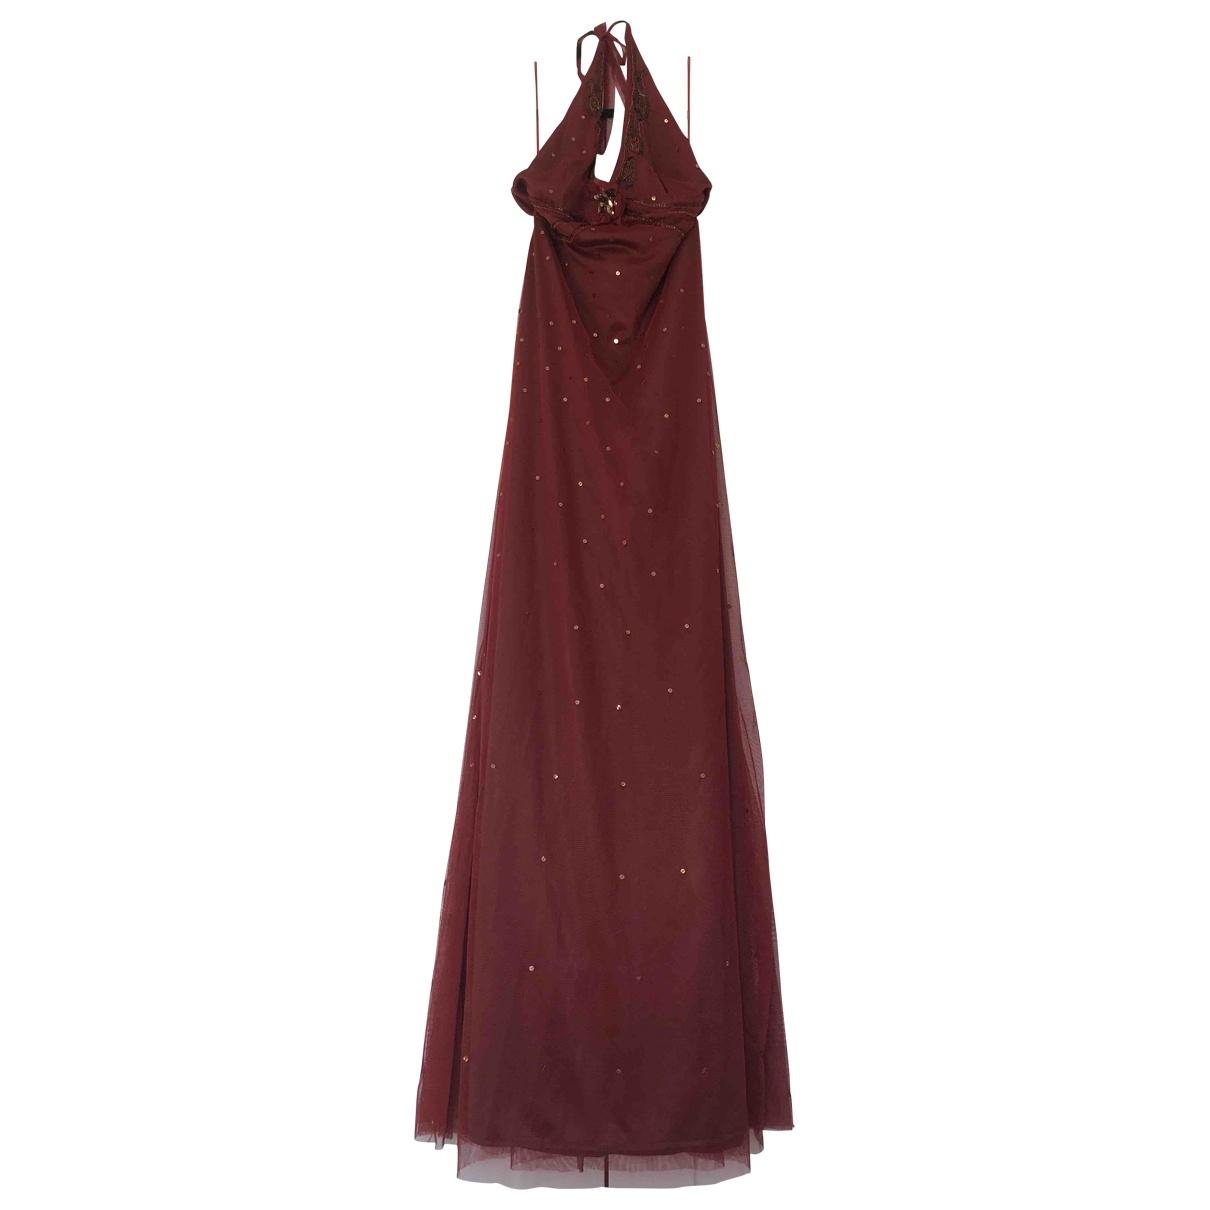 Mango \N Kleid in  Braun Polyester